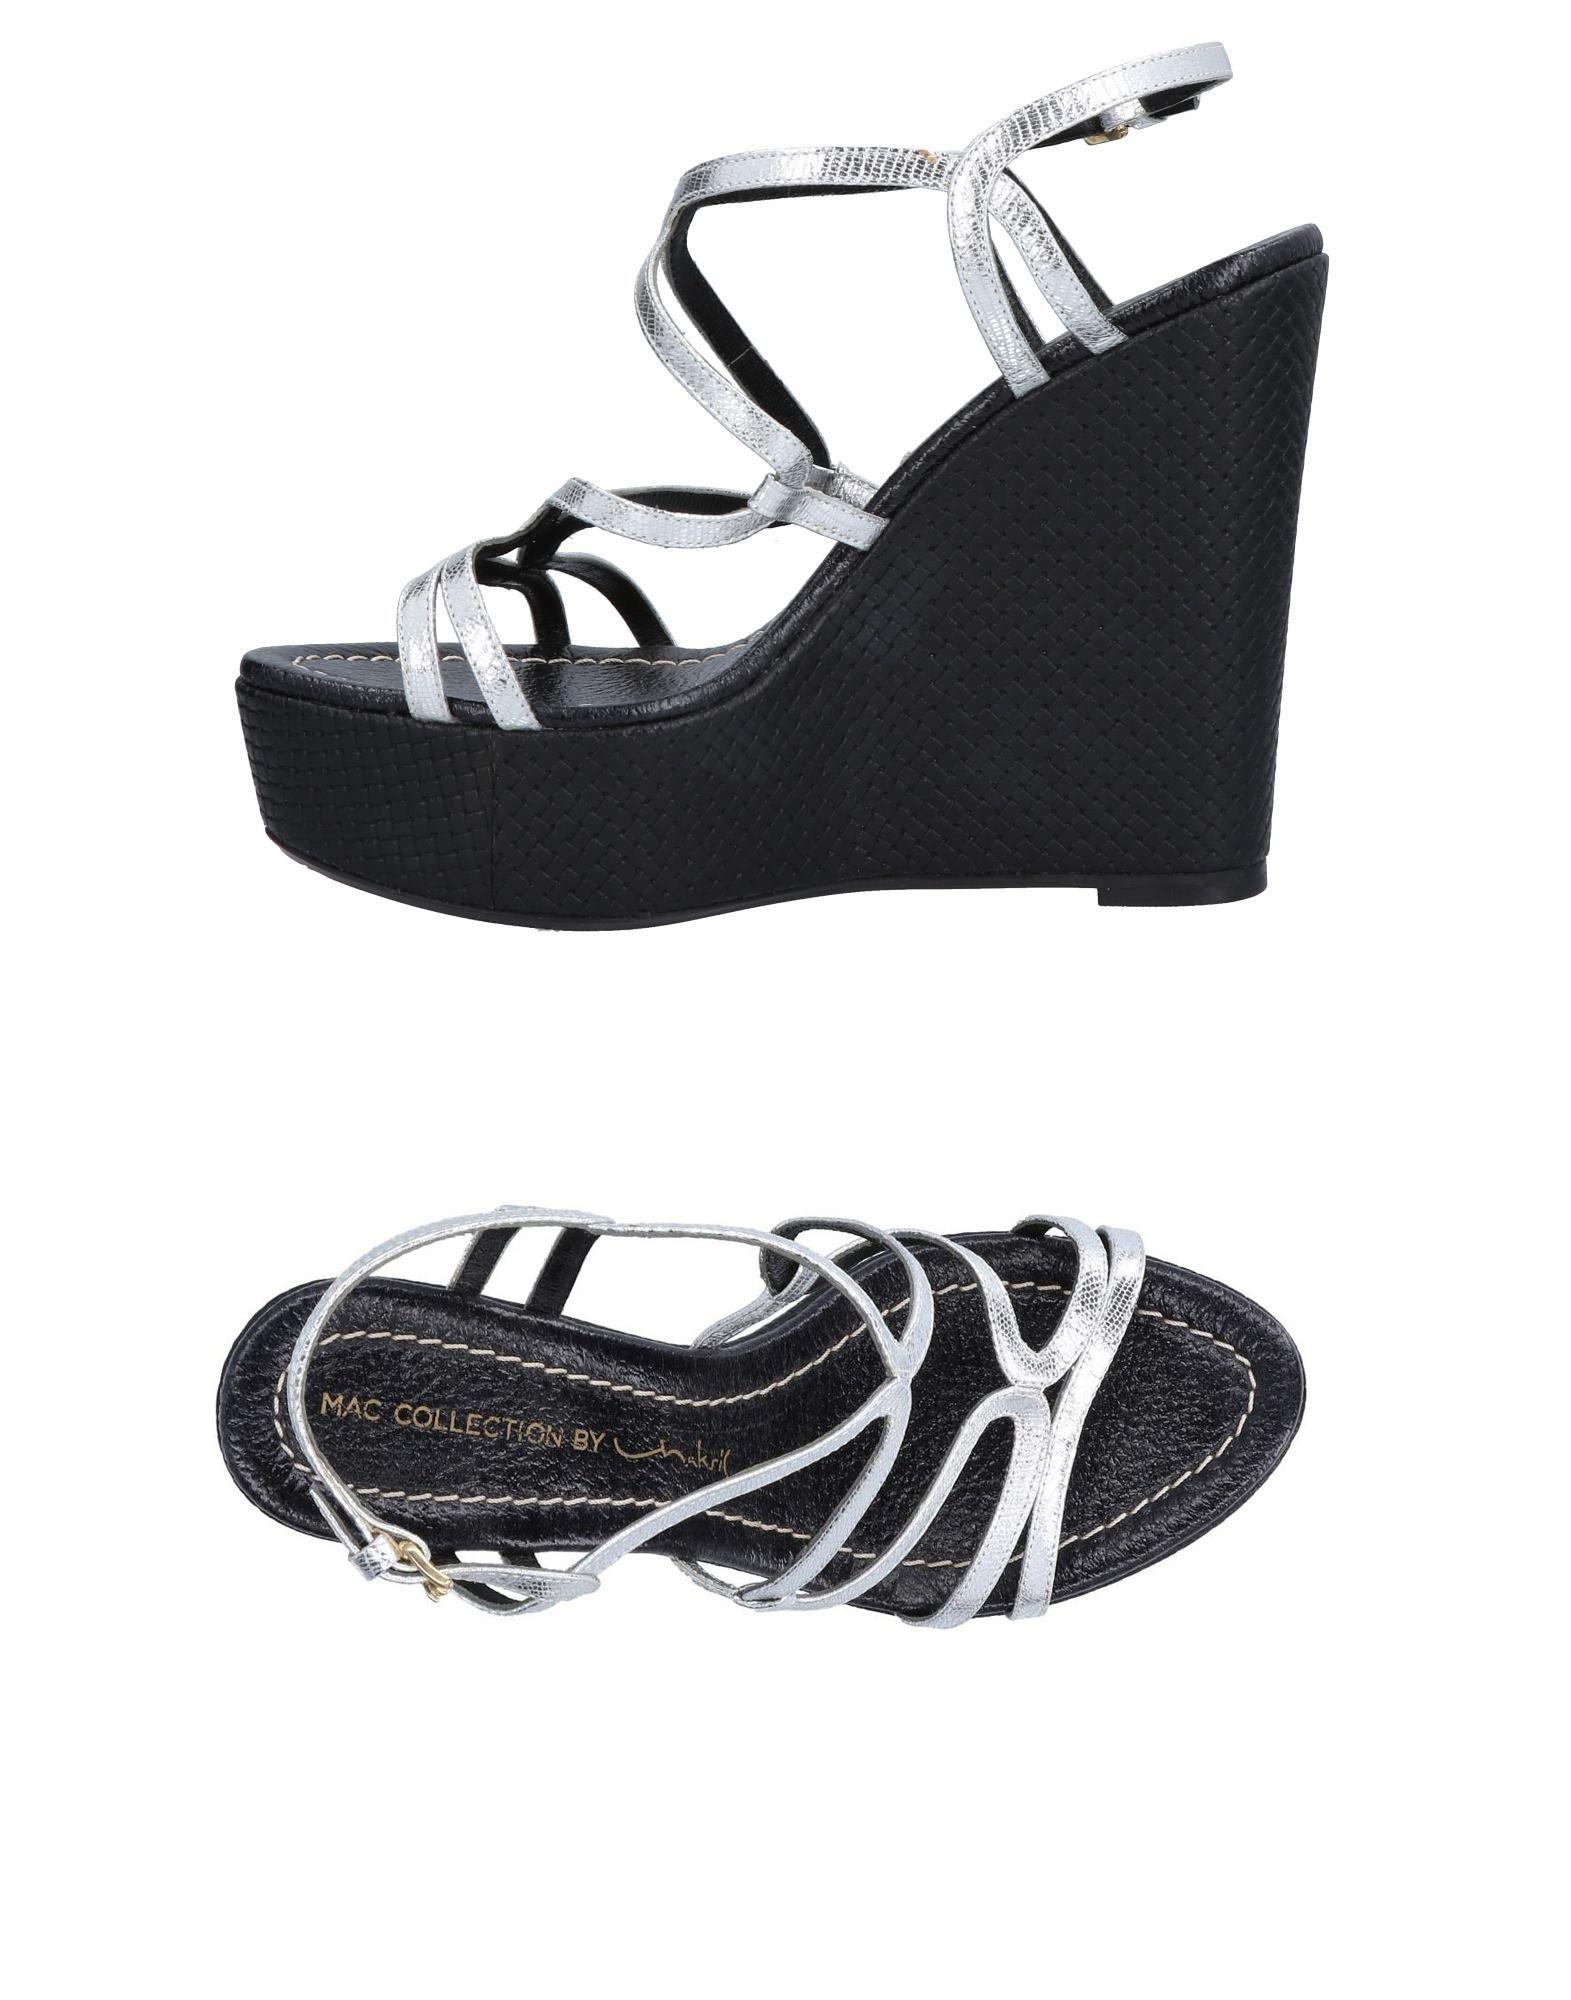 Sandali Mac Collection Donna - Acquista online su